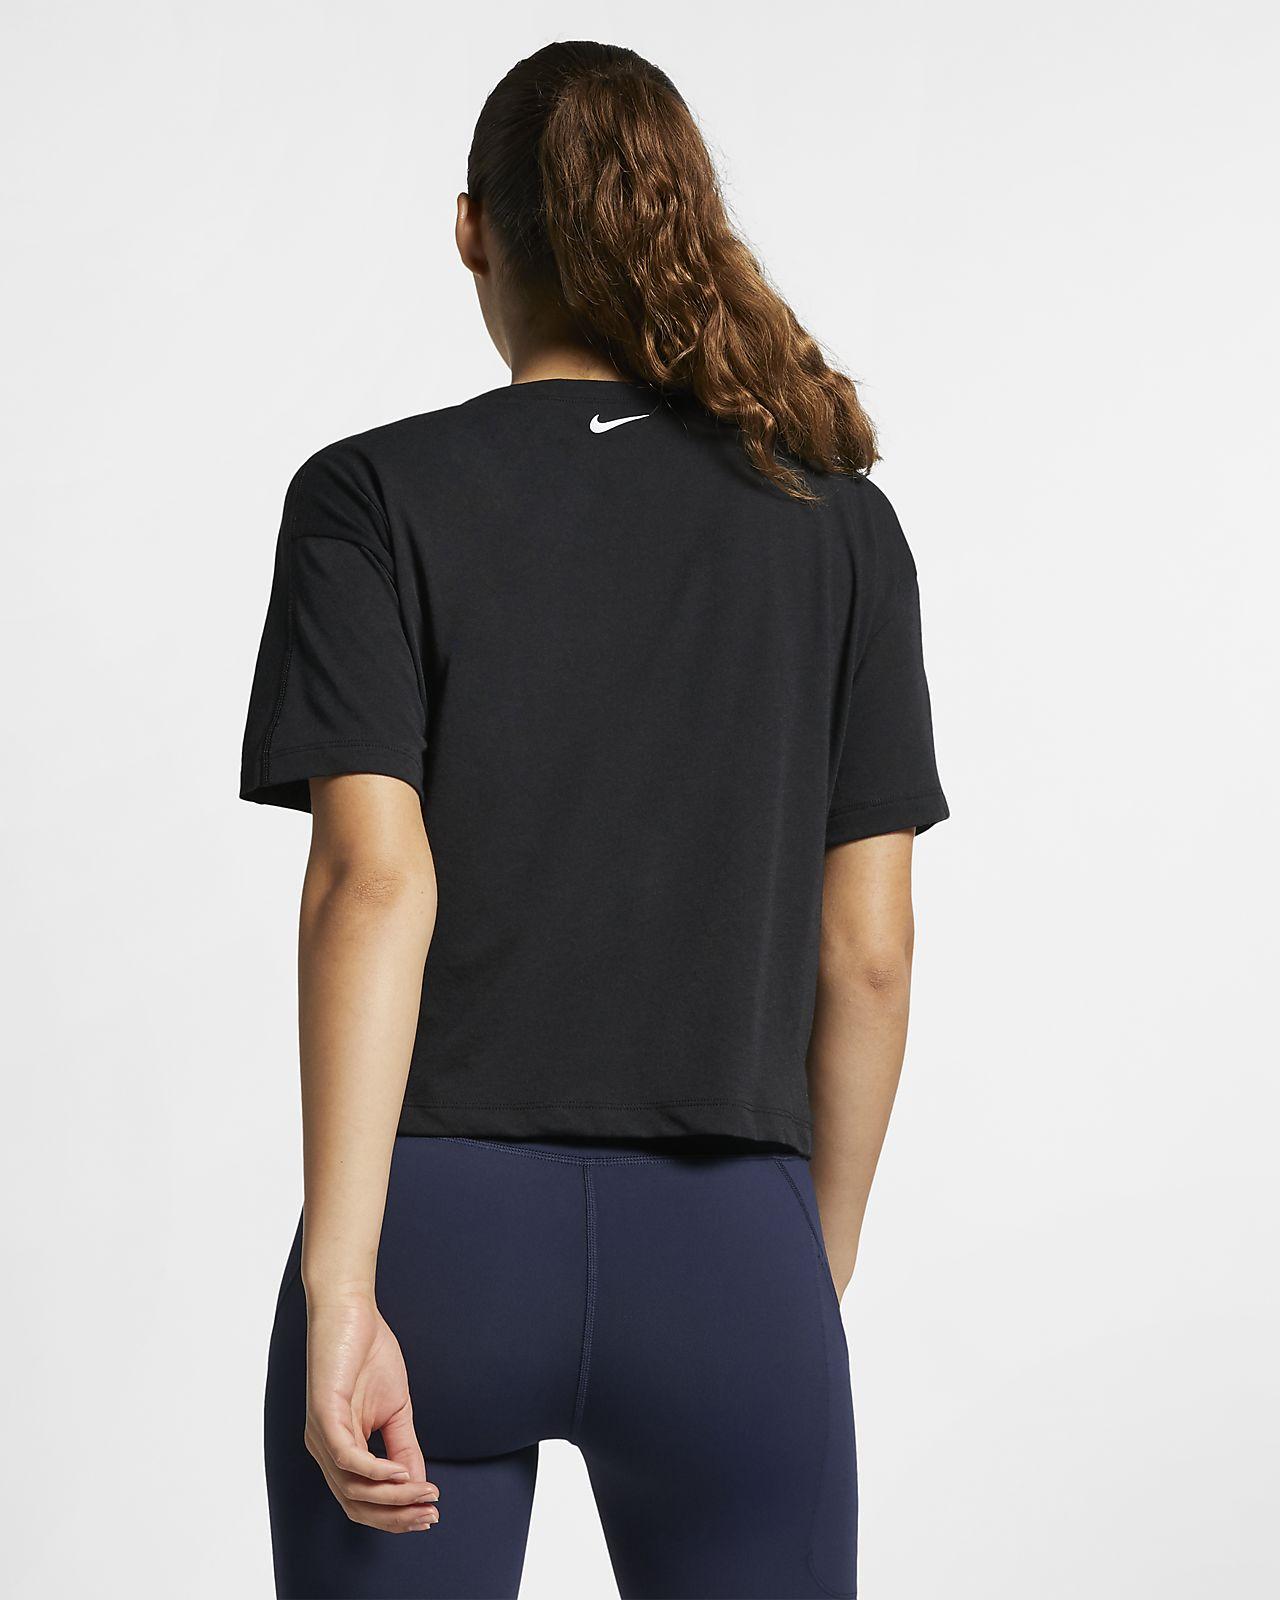 Nike Dri FIT Miler Kurzarm Laufoberteil für Damen